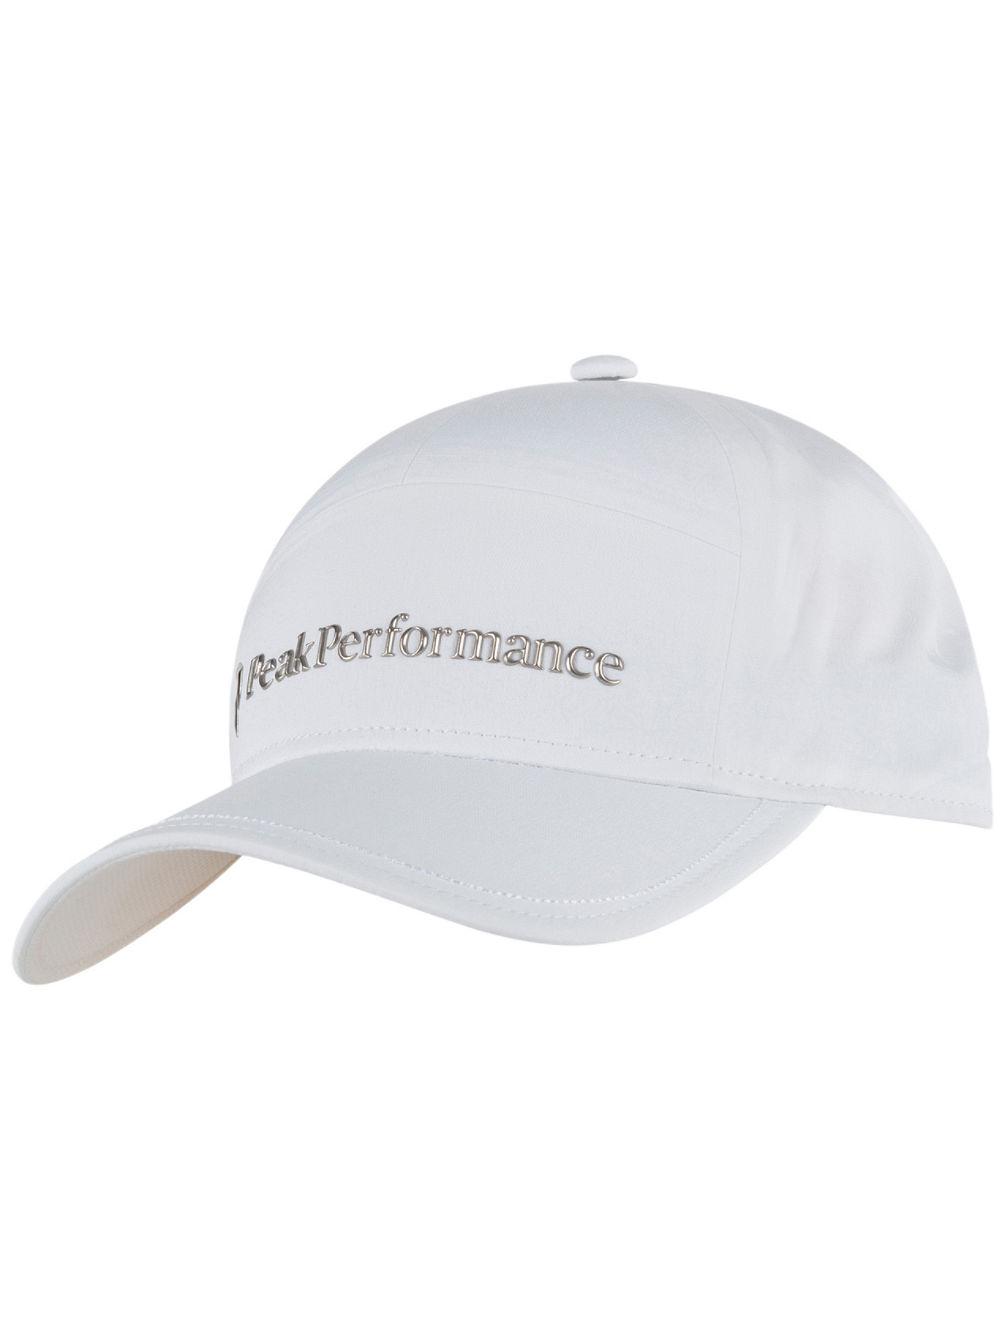 peak-performance-howick-cap